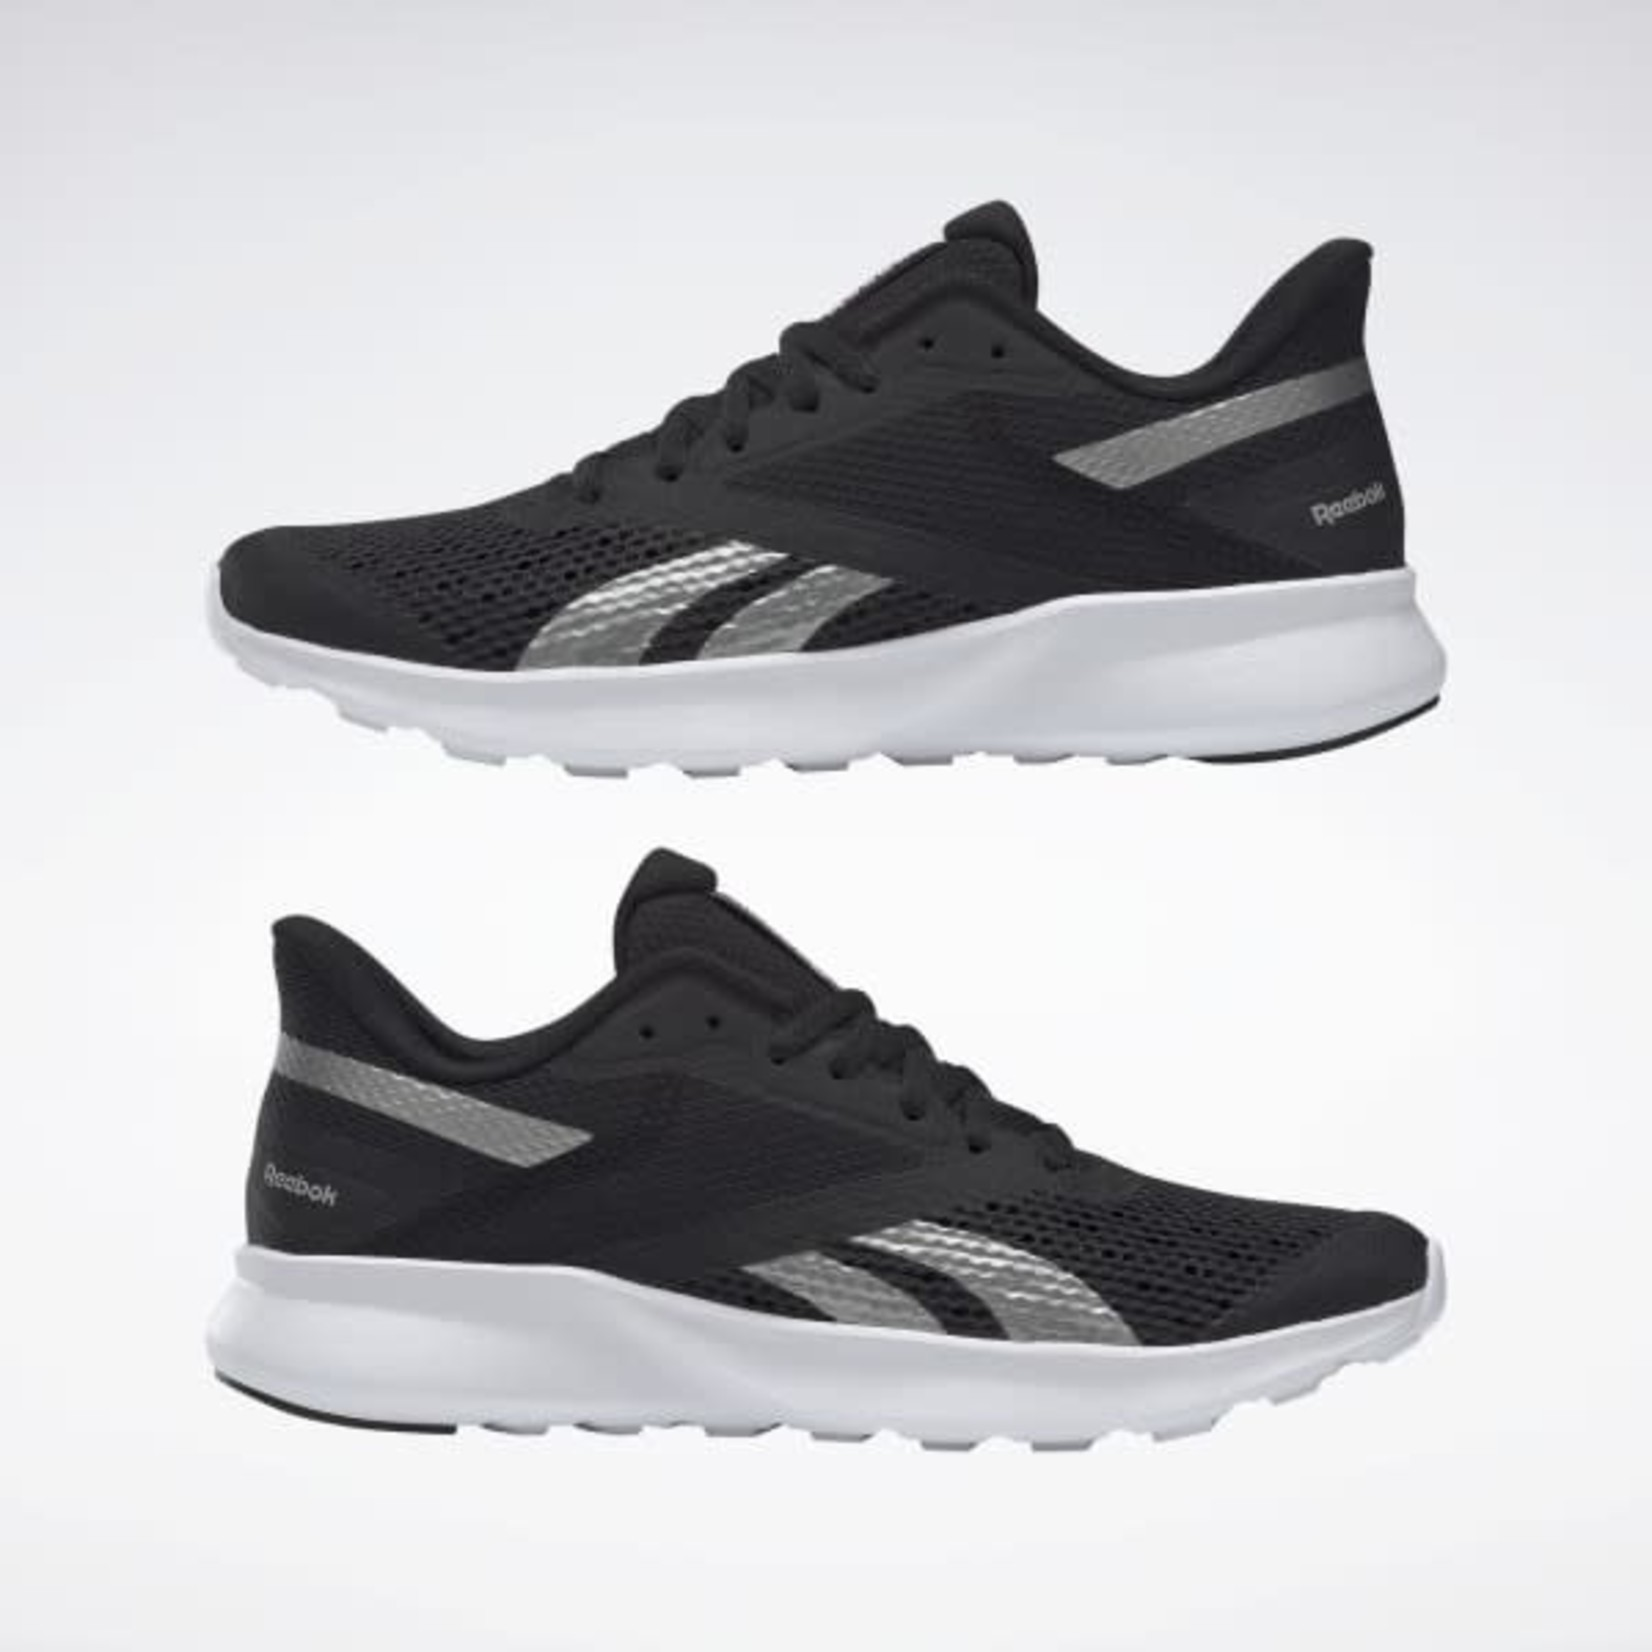 Women's Reebok Speed  Breeze 2.0 Running Shoes